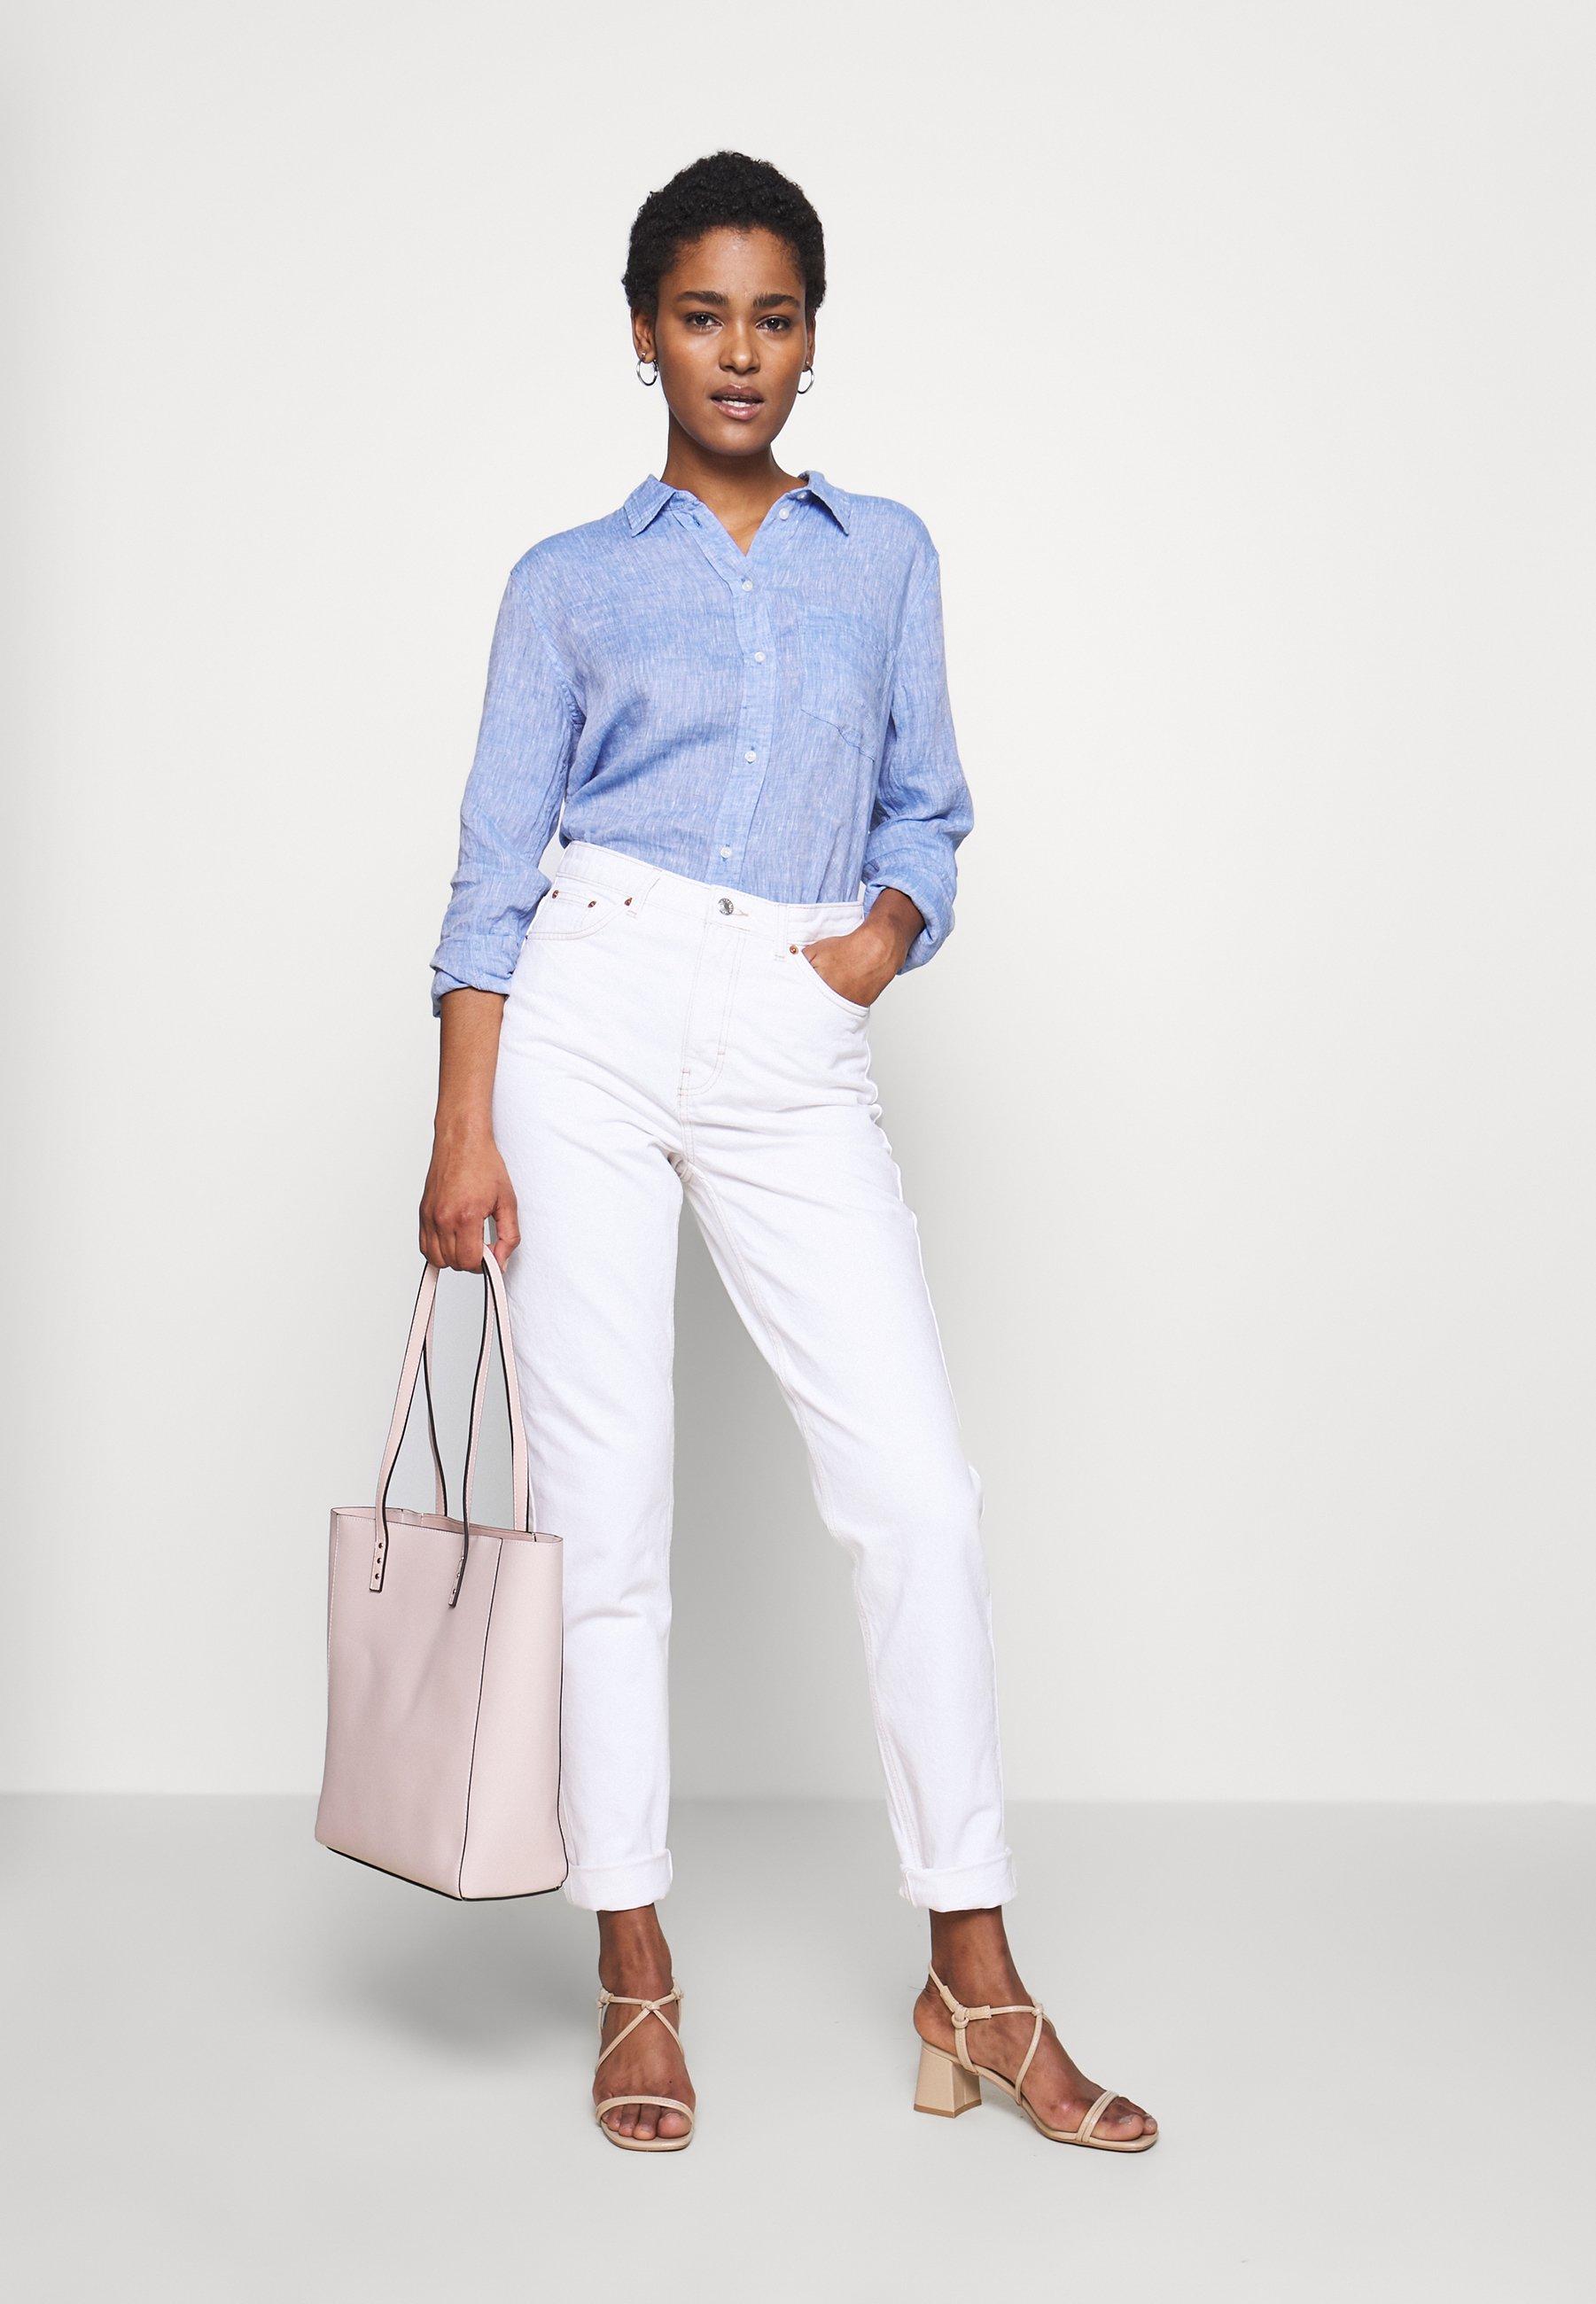 Even&odd Shopping Bag - Pink DcSxv